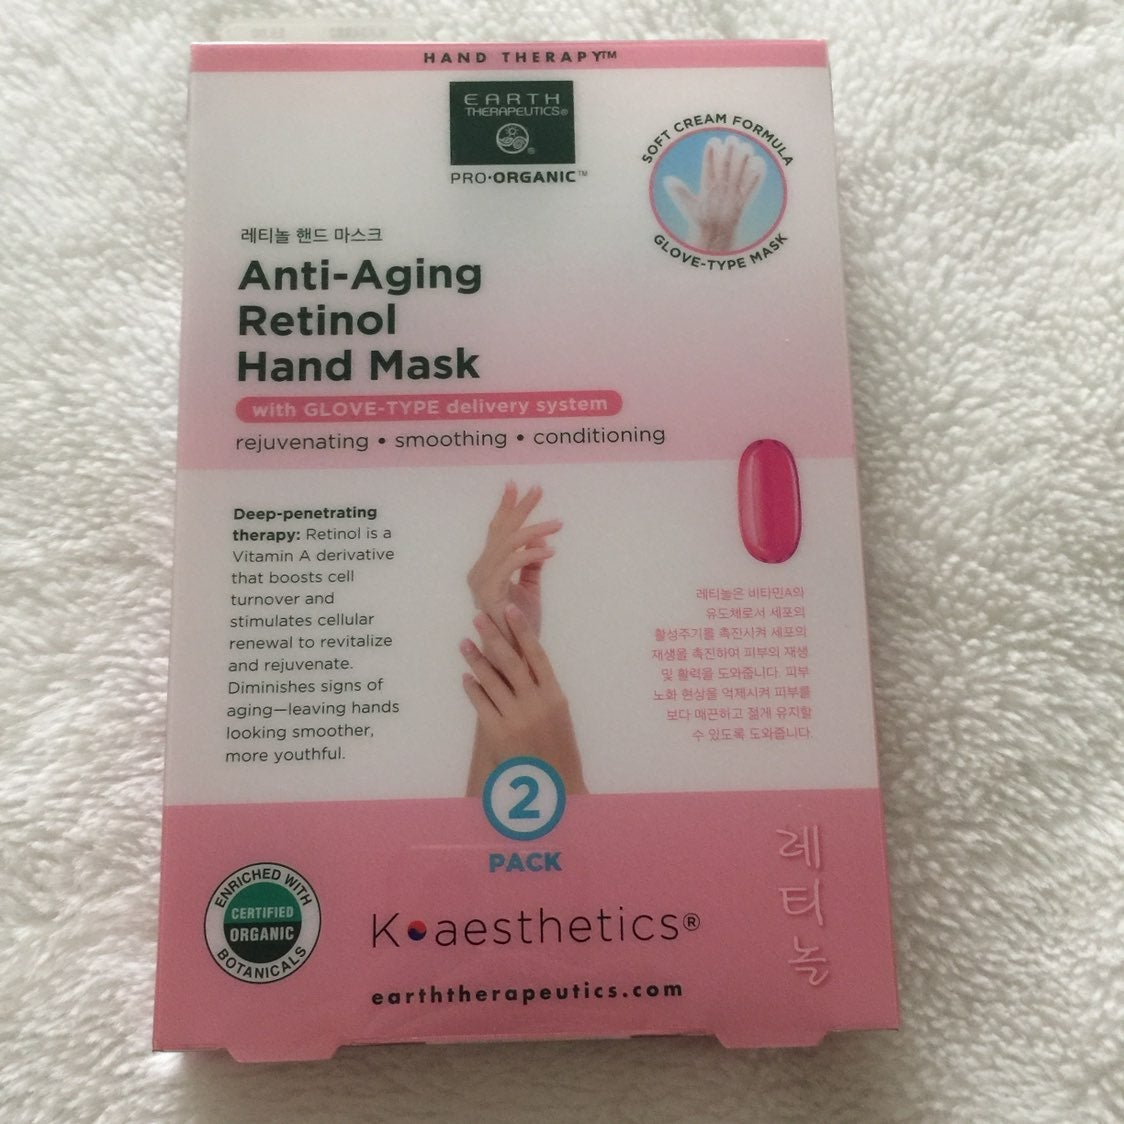 Earth therapeutics Hand Masks